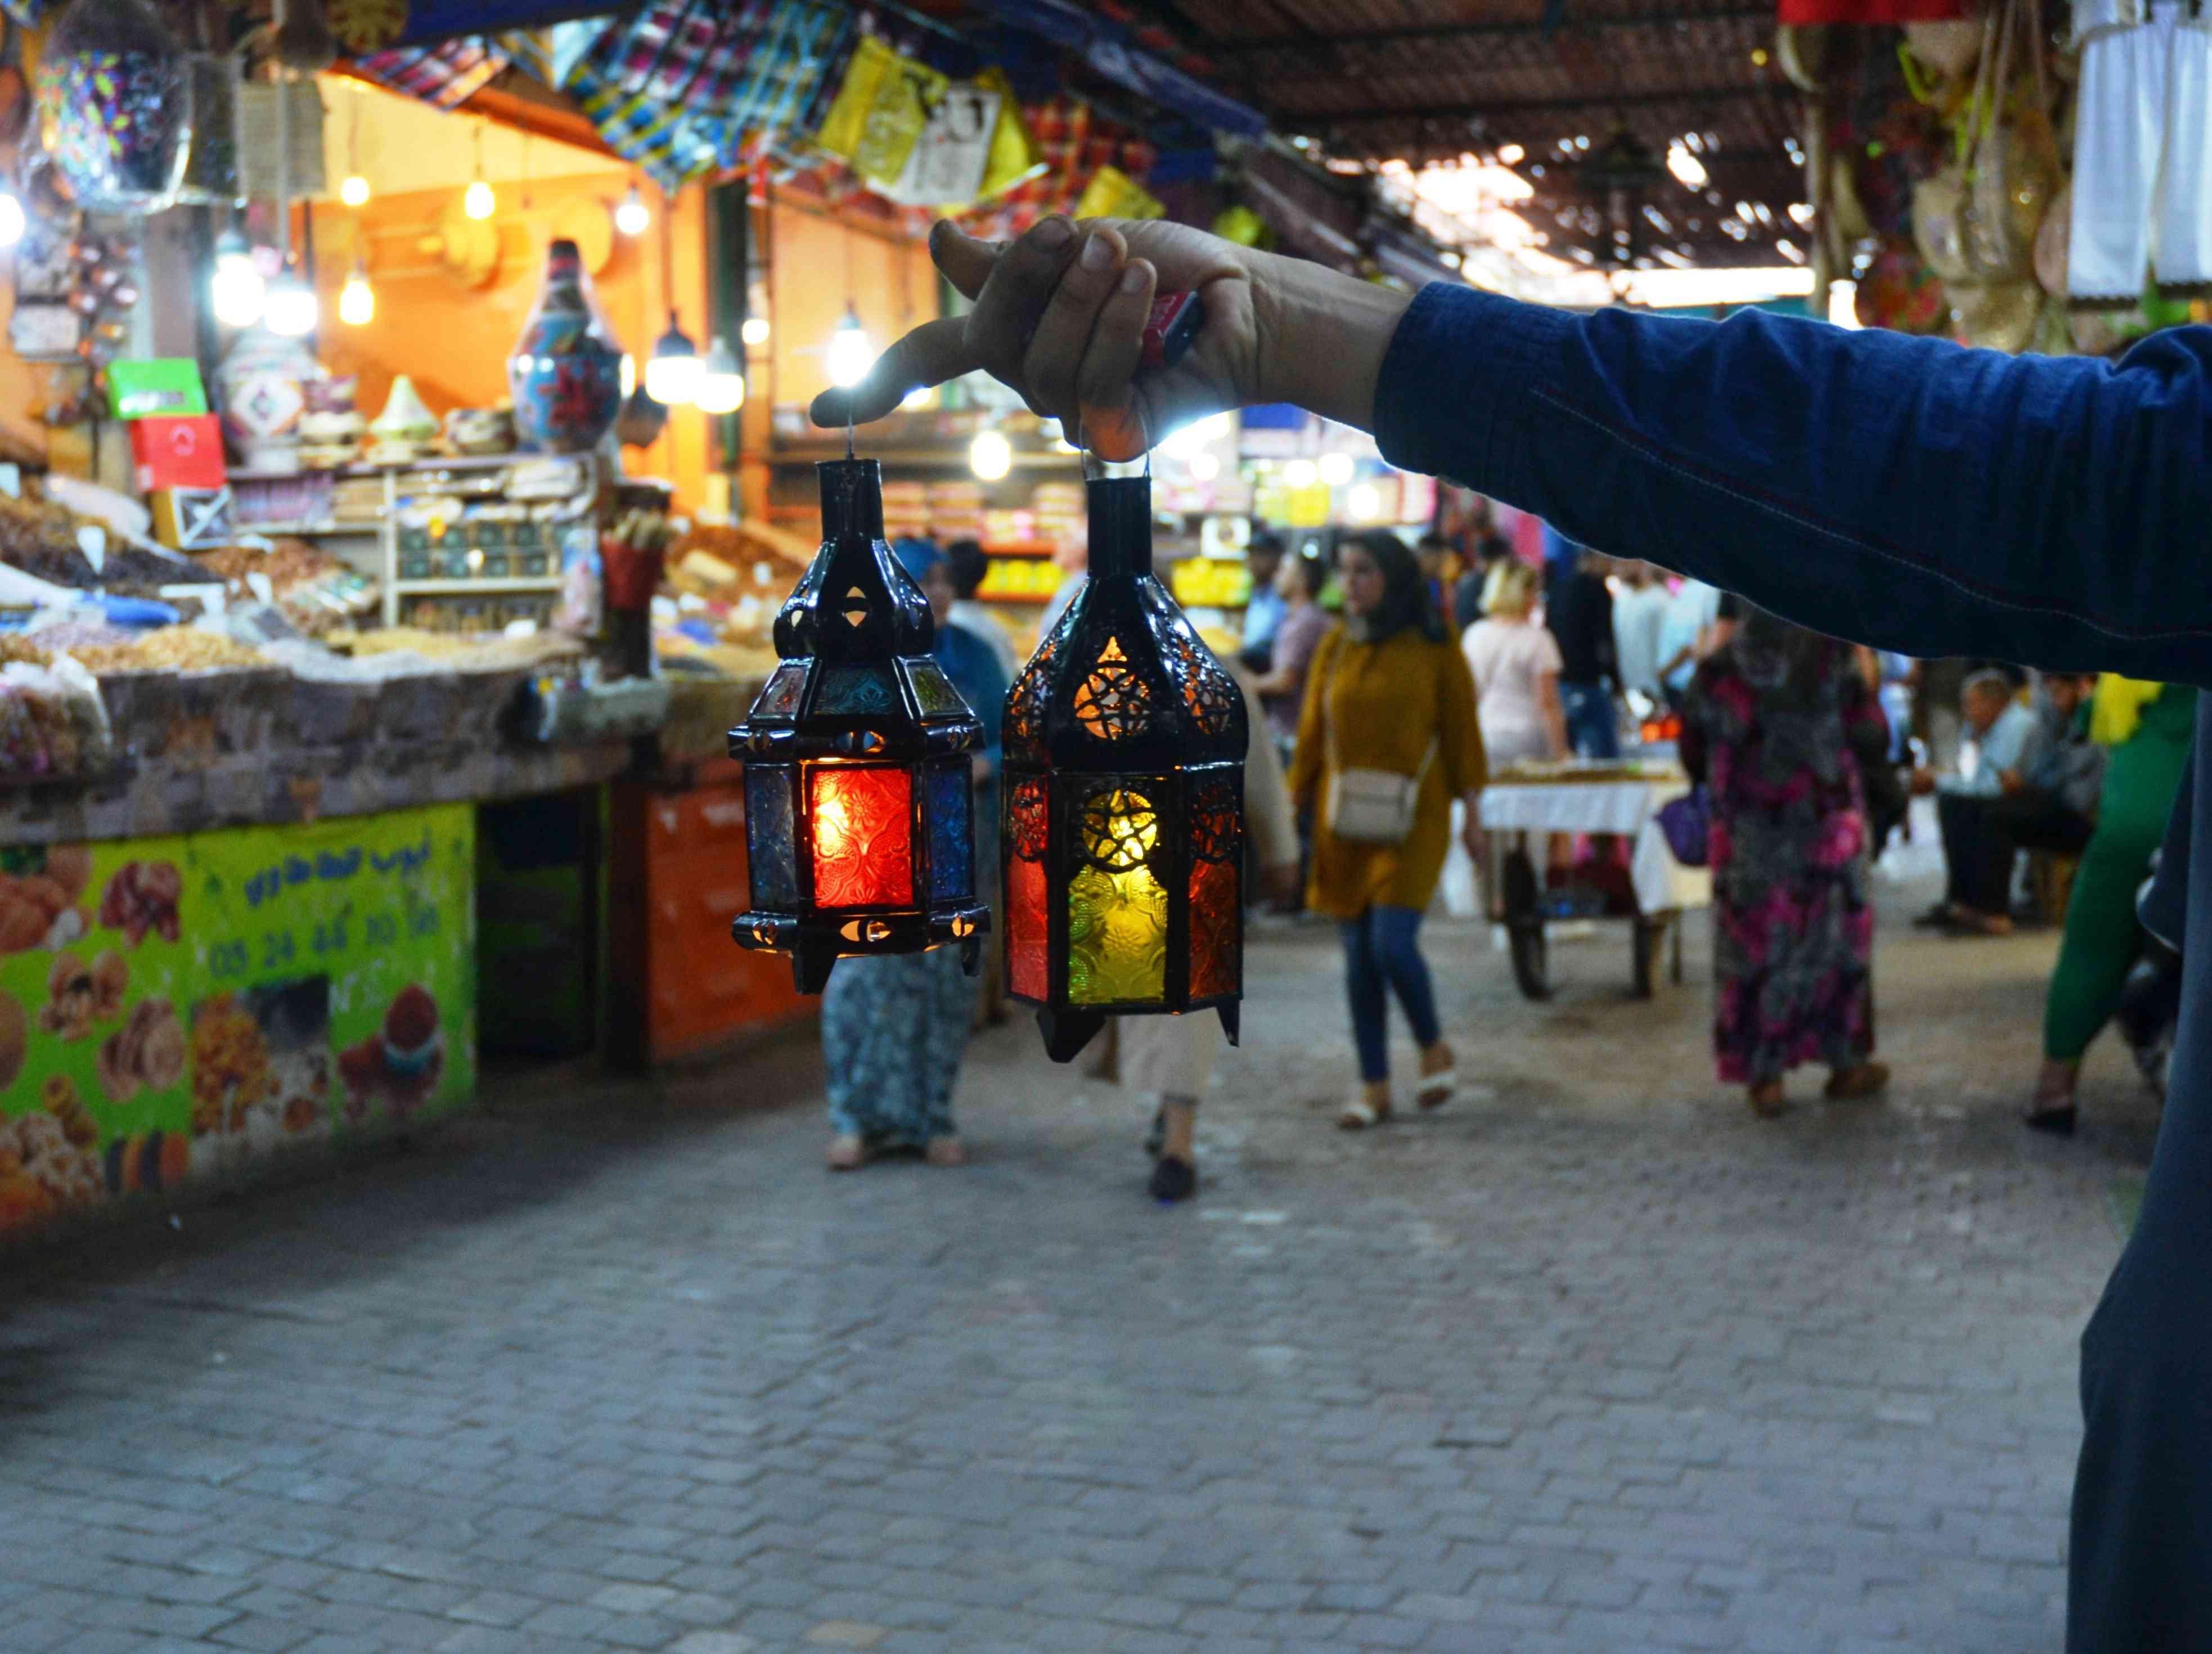 The Lantern Vendor